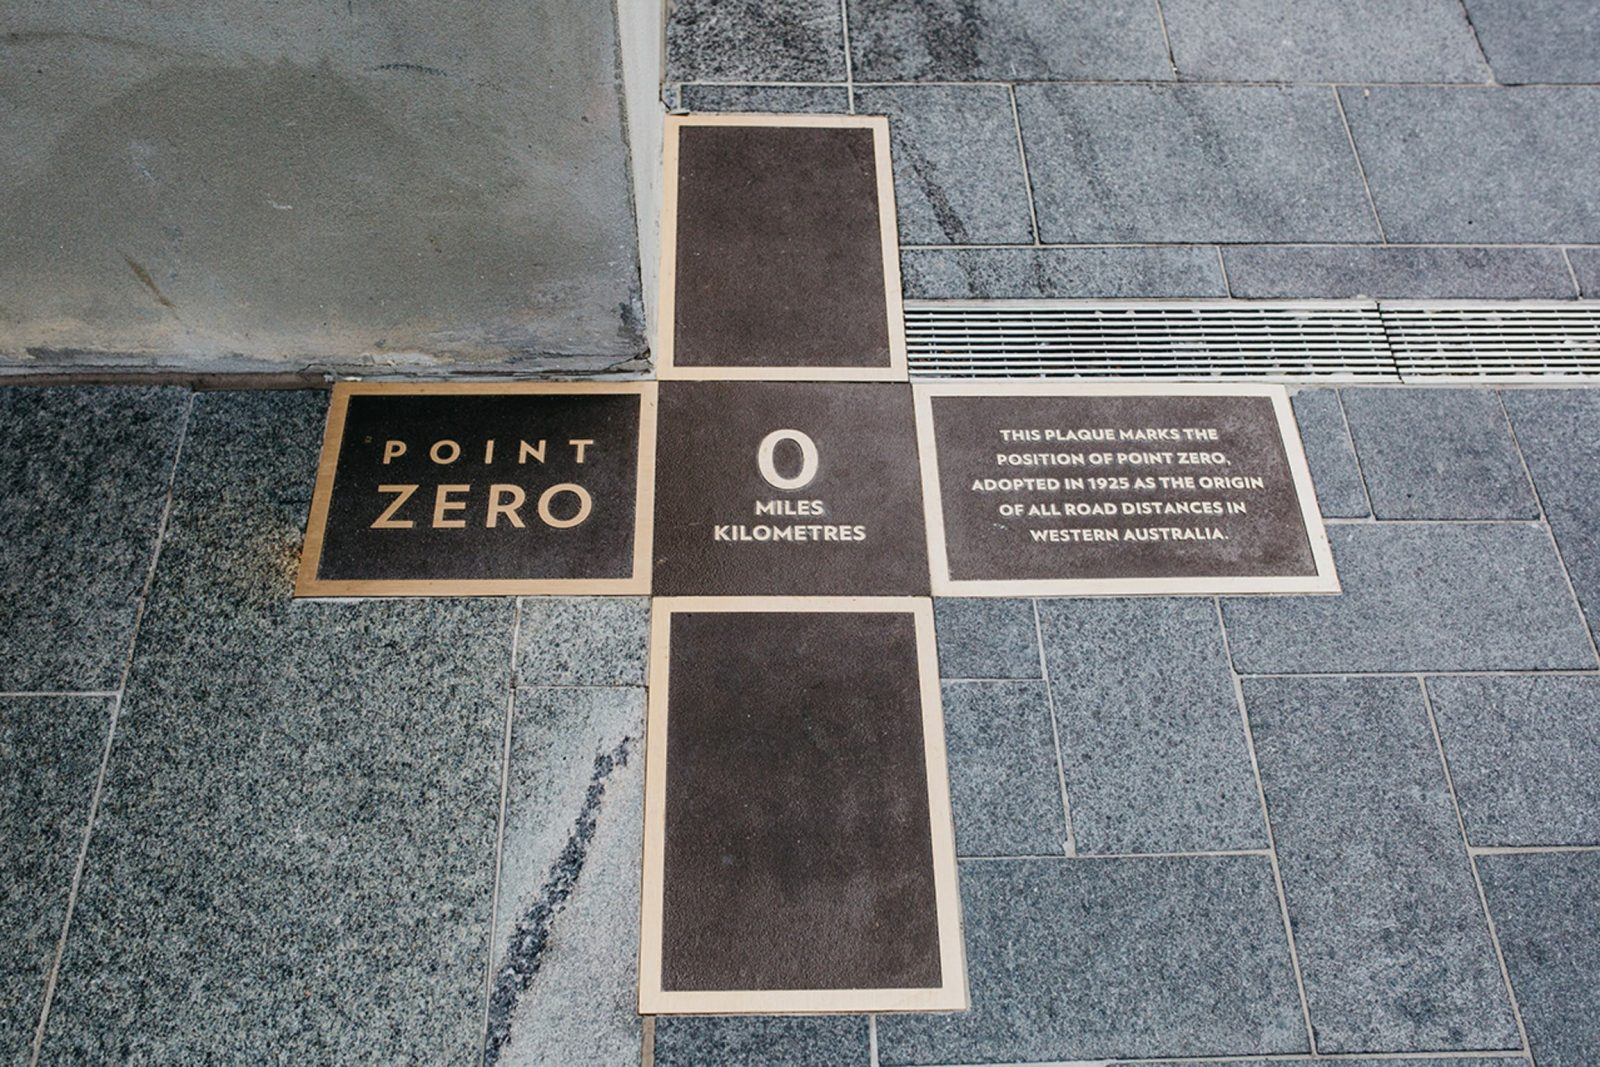 Point Zero, Perth, Western Australia